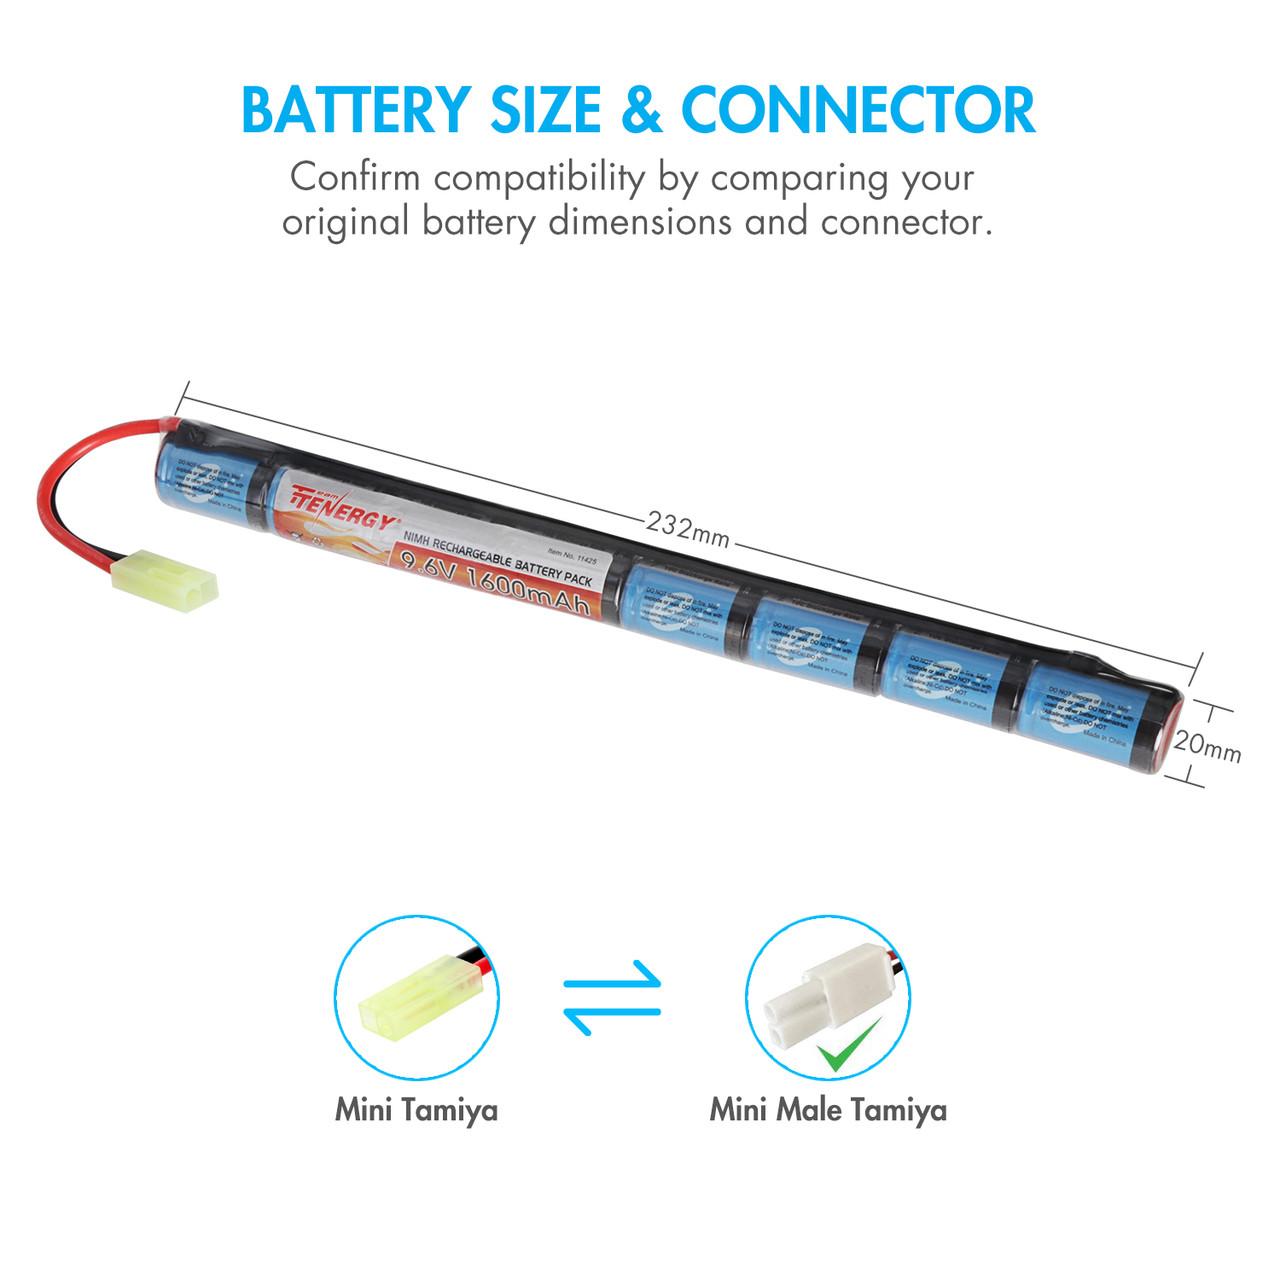 Tenergy Airsoft NiMH 9.6V 1600mAh Stick  Battery Pack w/ Mini Tamiya Connector